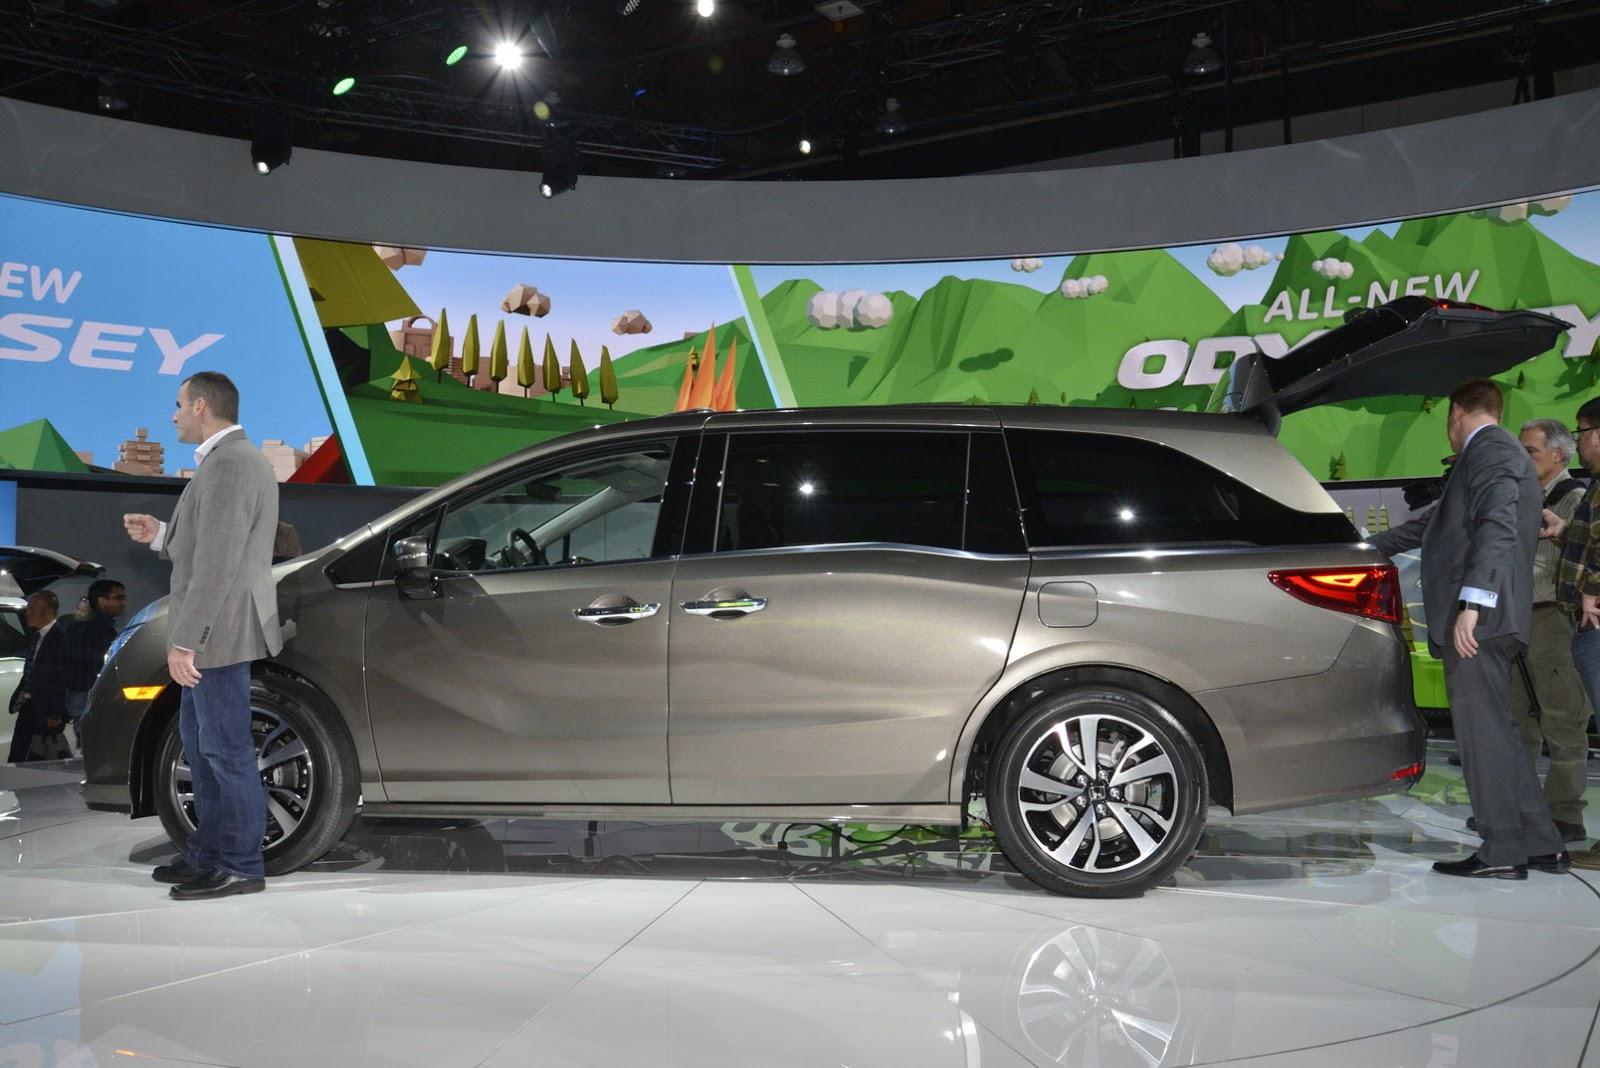 Honda Odyssey MY 2018 (Foto 12 di 67)